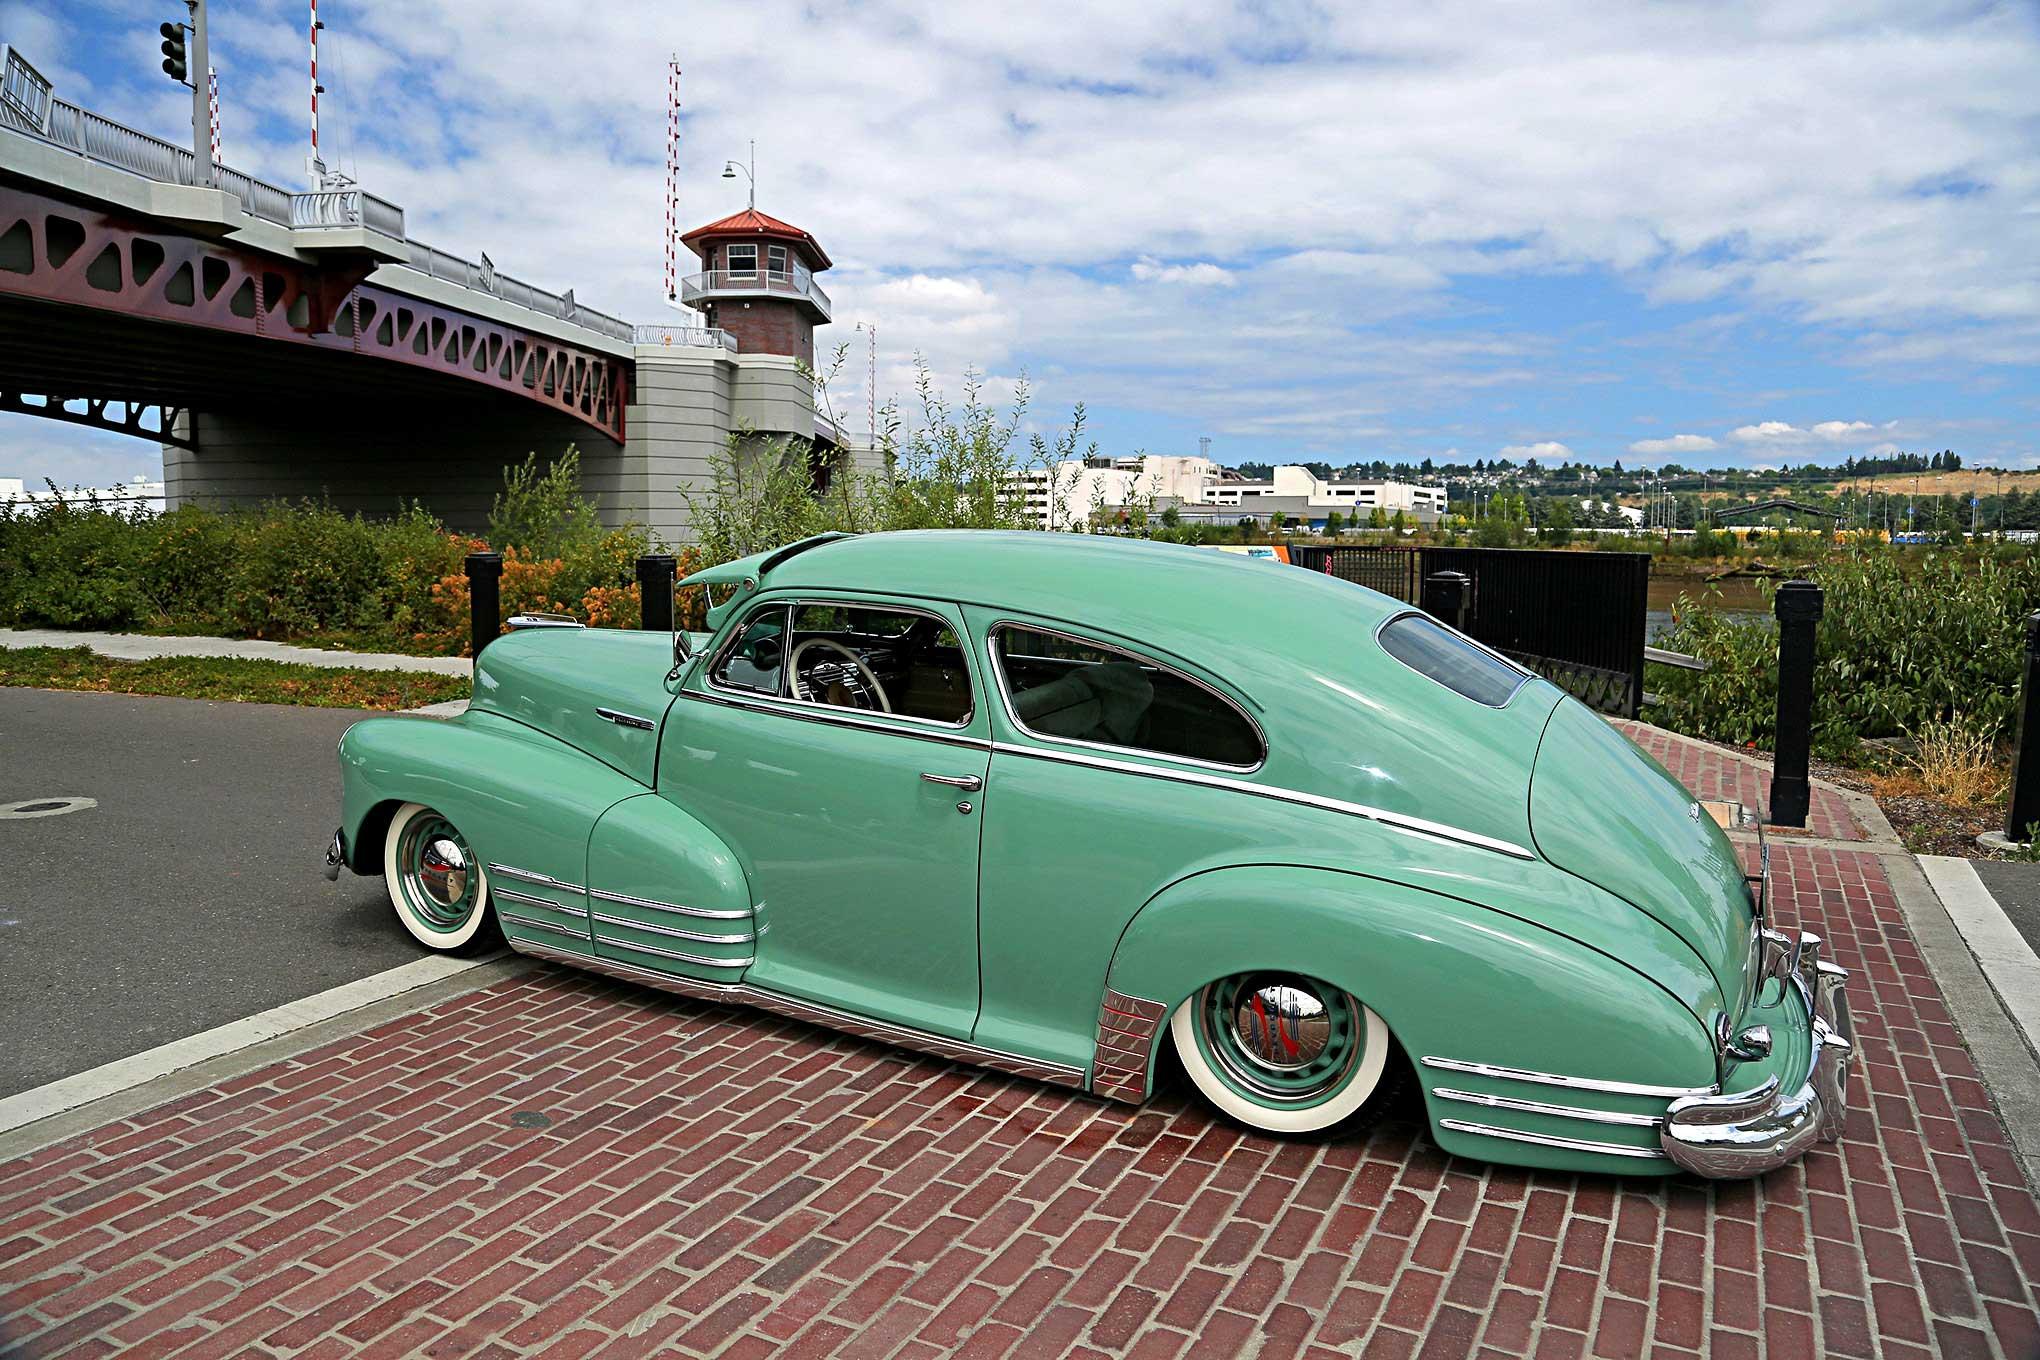 1948 Chevy Fleetline  A Piece of American History